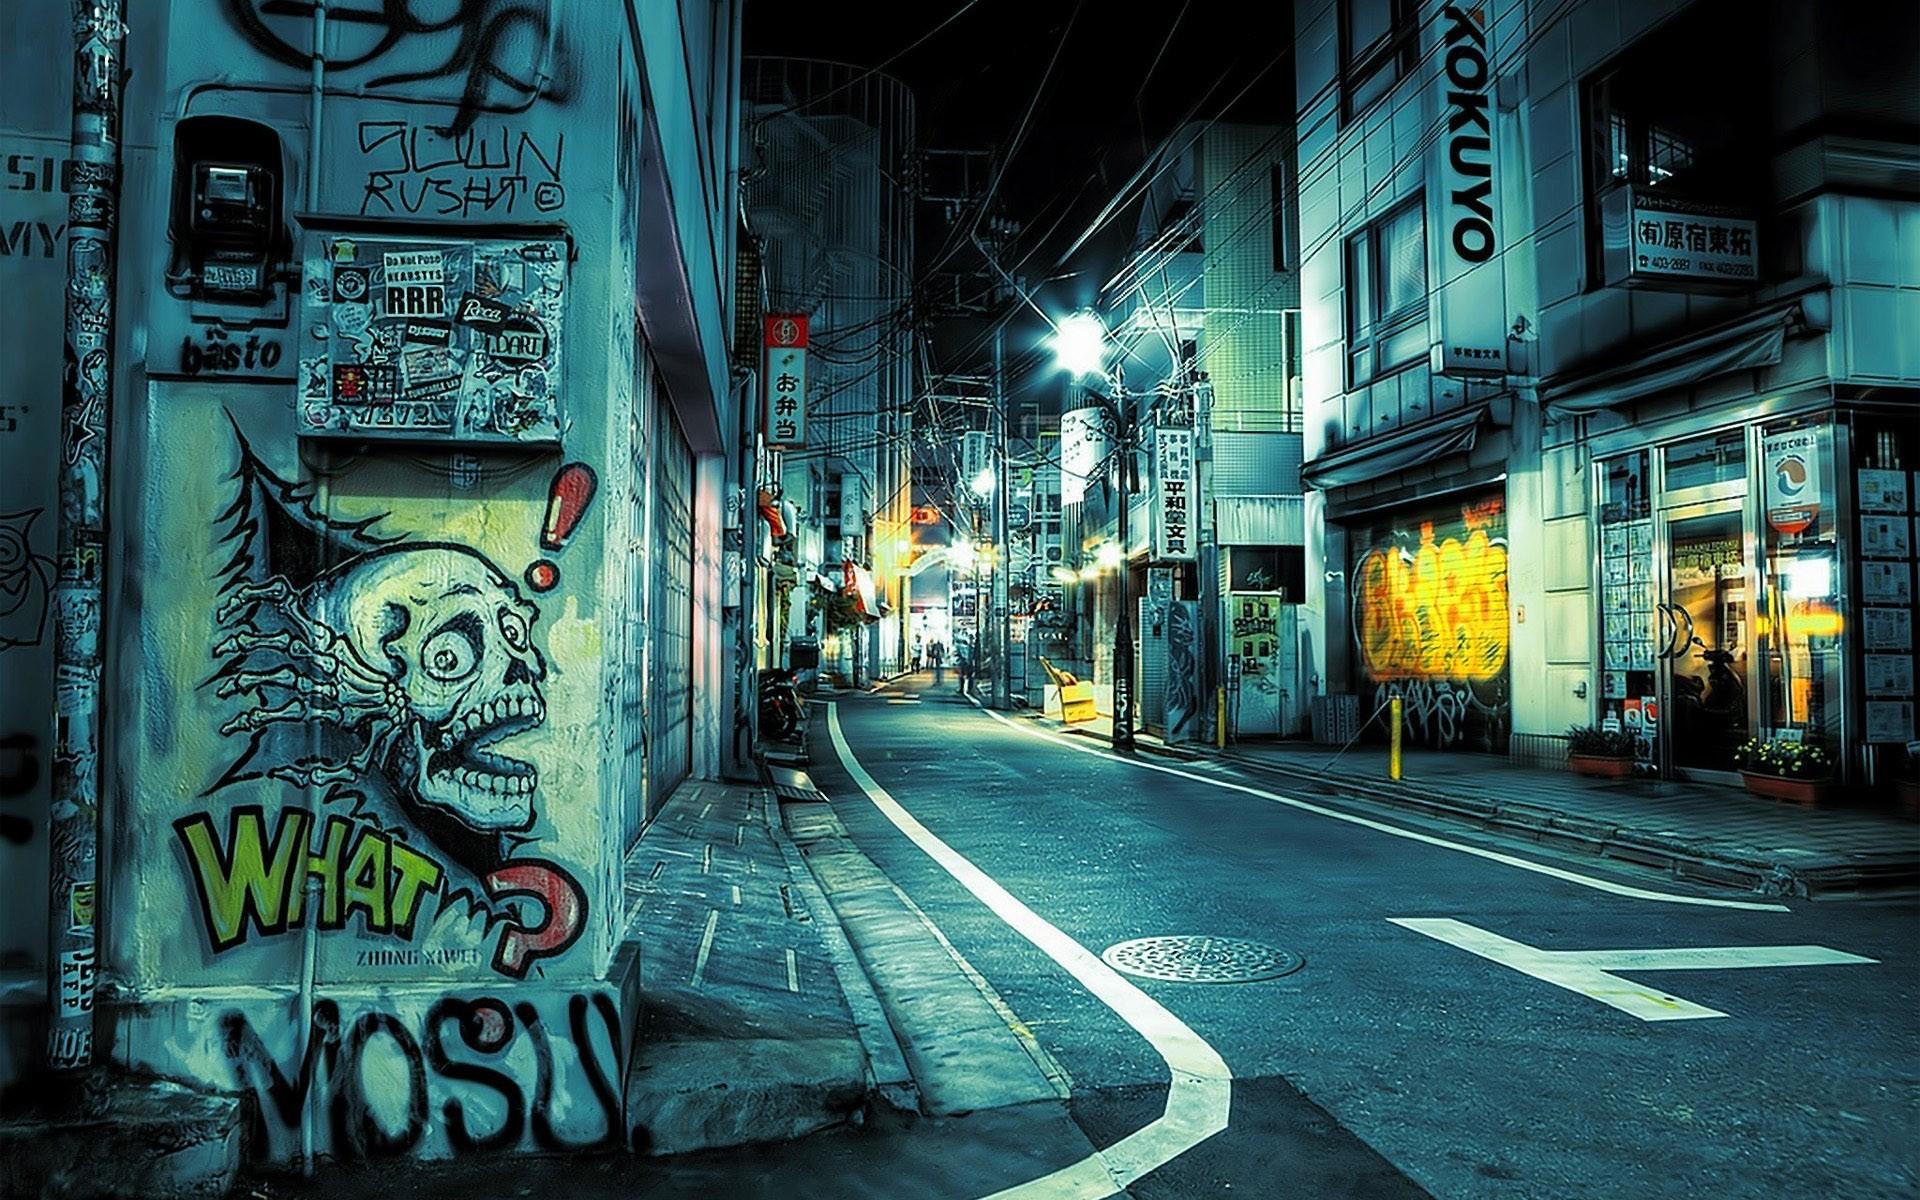 Japan Tokyo Street Night Desktop Wallpaper.jpg (1920×1200) | Tokyo |  Pinterest | Tokyo streets, Tokyo night and Tokyo